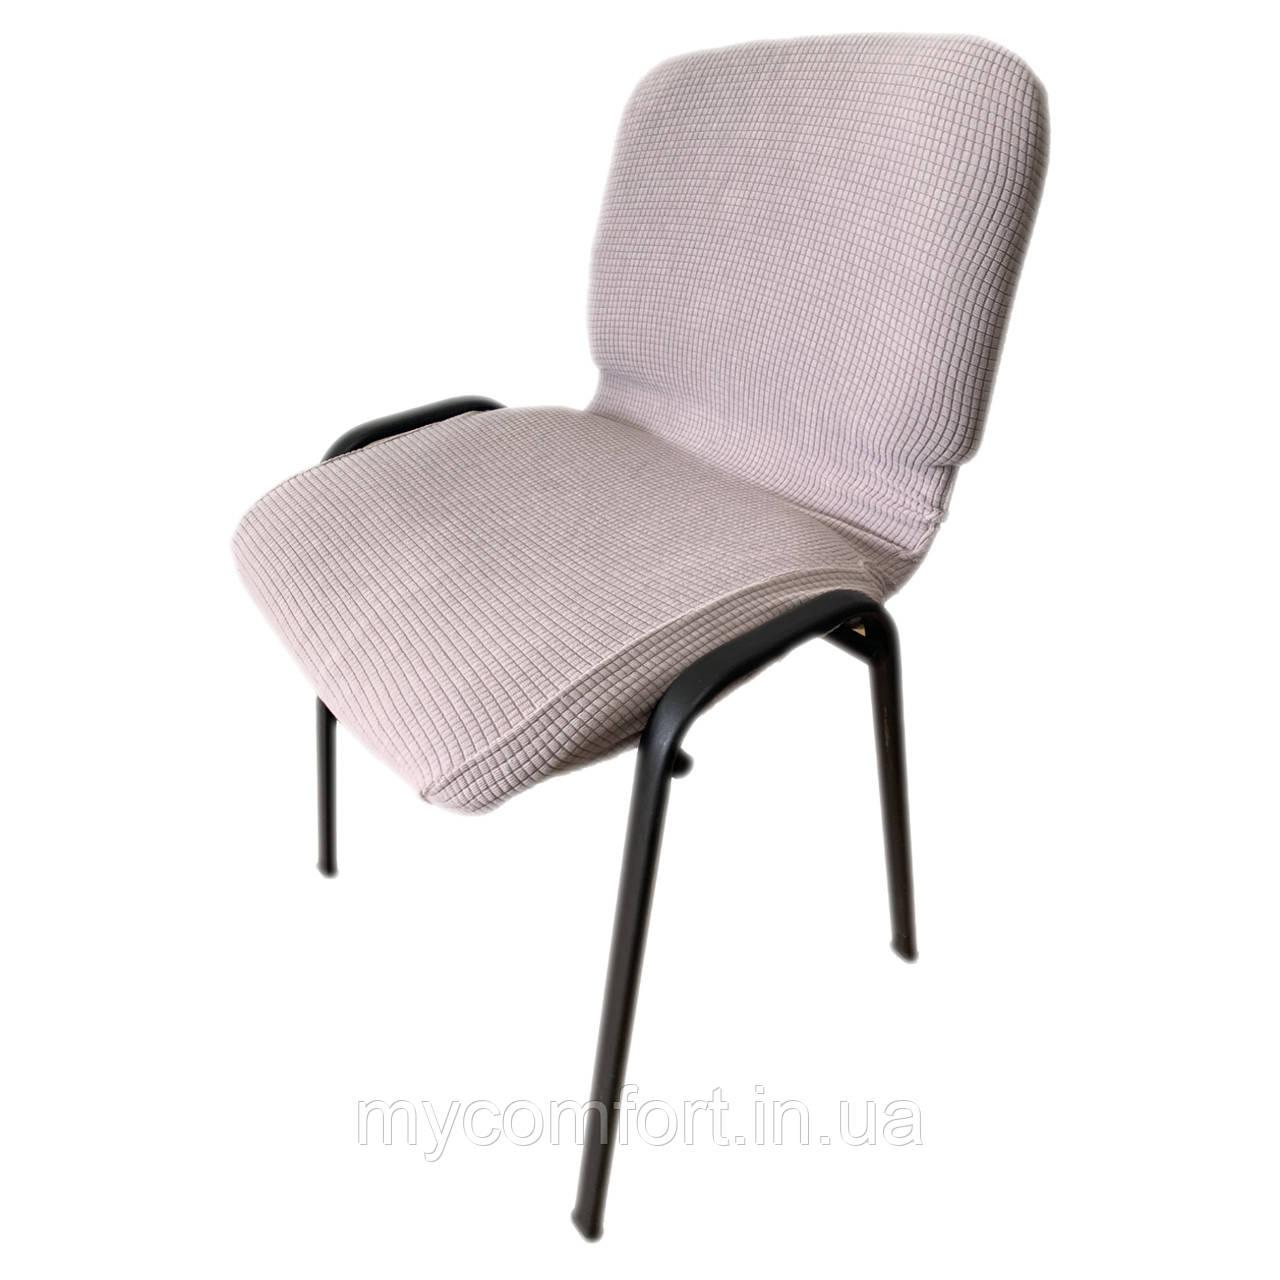 Чехол на офисный стул. Светло-Серый (KareOffice)